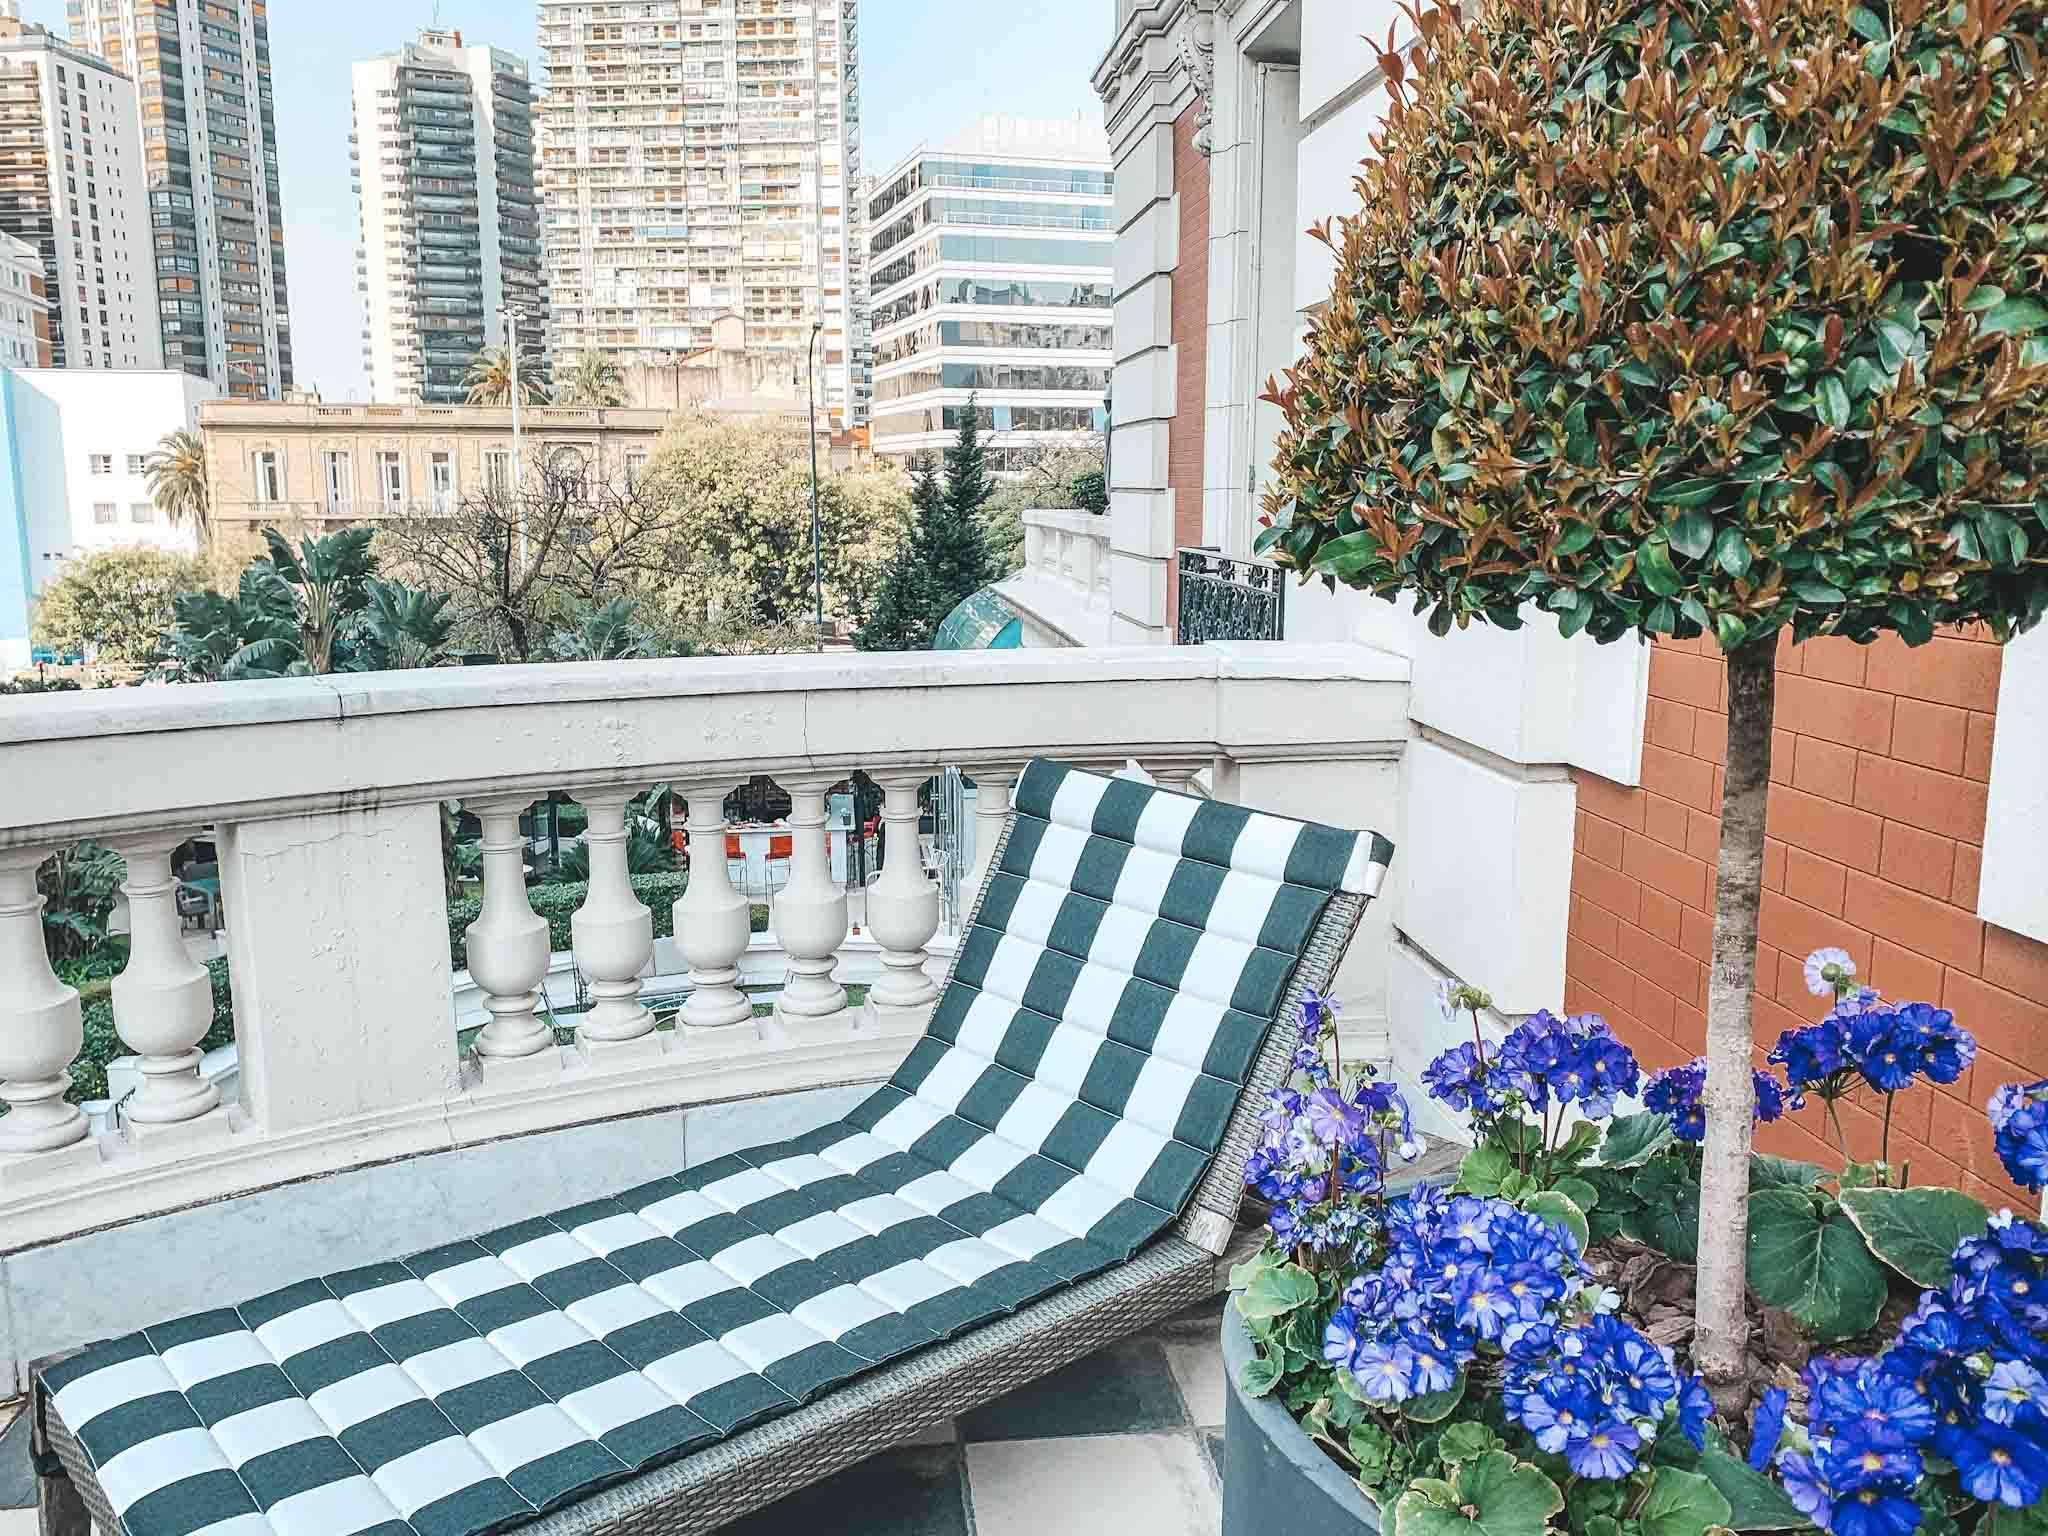 Suite Presidencial Four Seasons Buenos Aires - La Mansion 101 - o melhor hotel de Buenos Aires - Recoleta